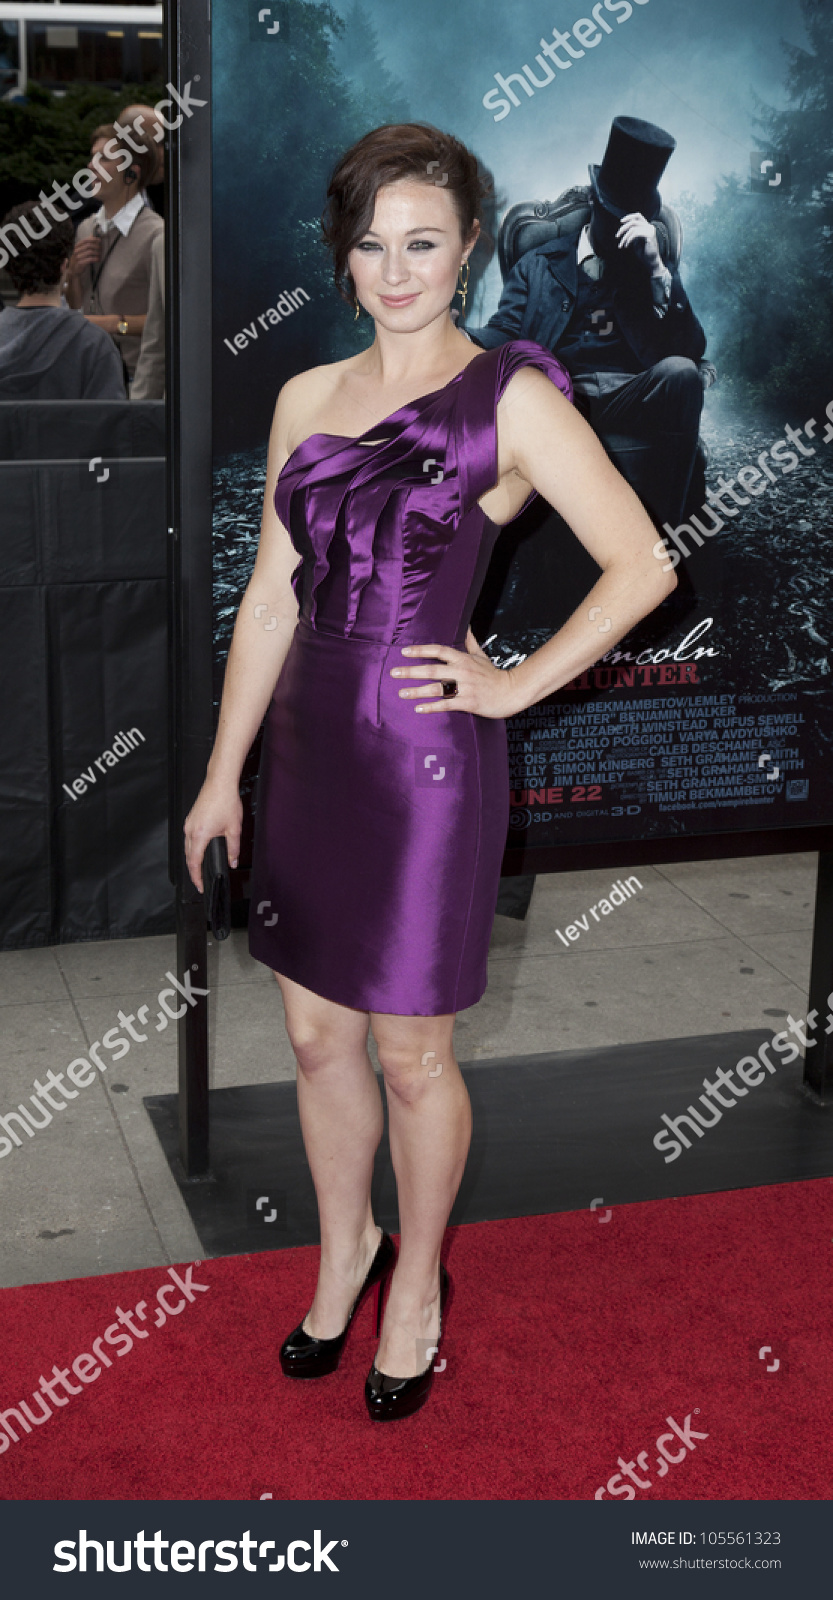 Anna Jagodzinska 1 2009,Tara Fitzgerald Erotic movies Katrina Begin,Joanna Going